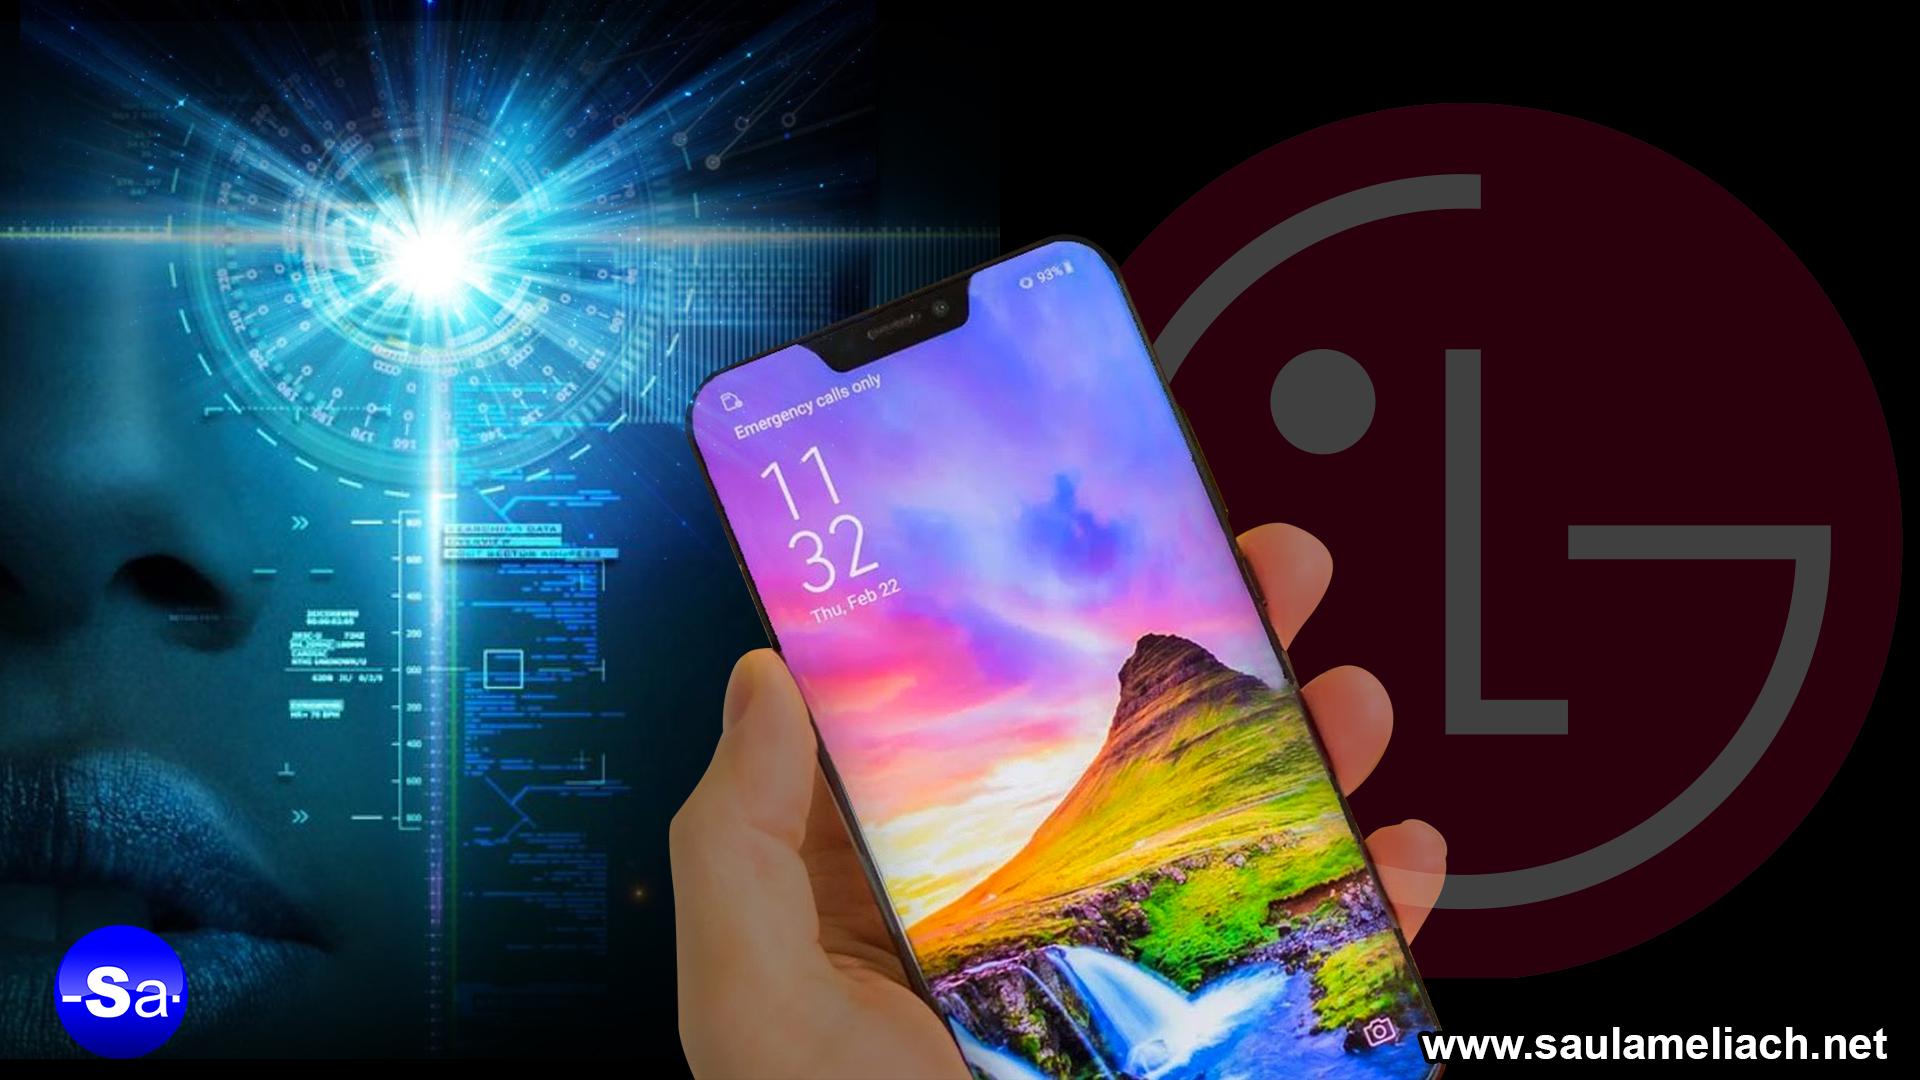 saul ameliach - LG Electronics - LG G7 ThinQ